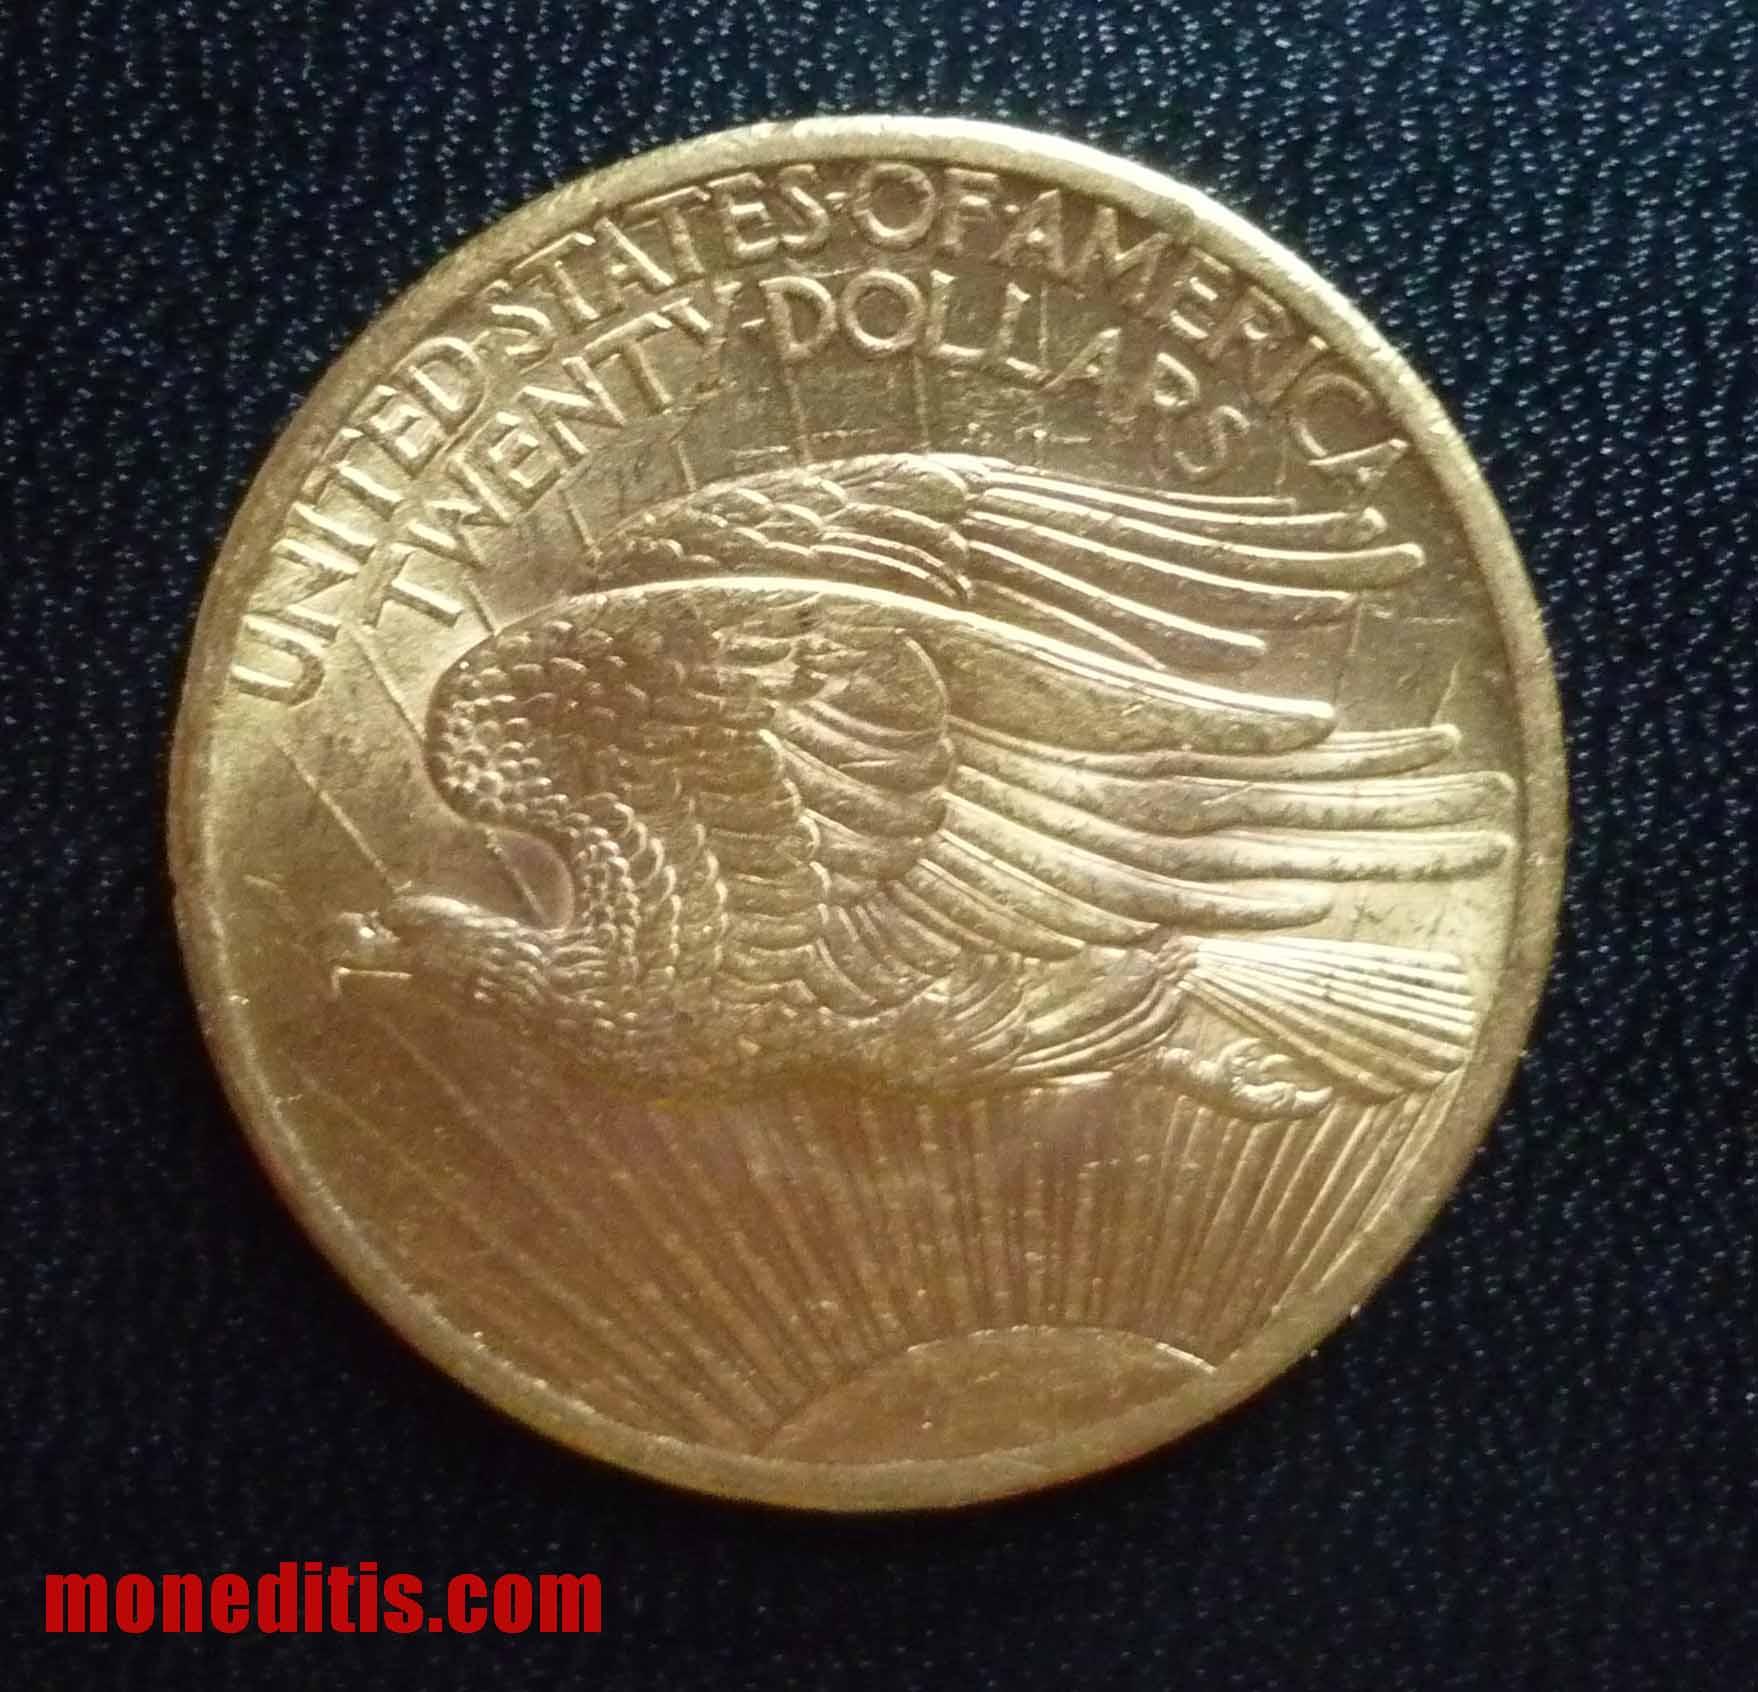 1907 20 $ double eagle St. Gaudens 23